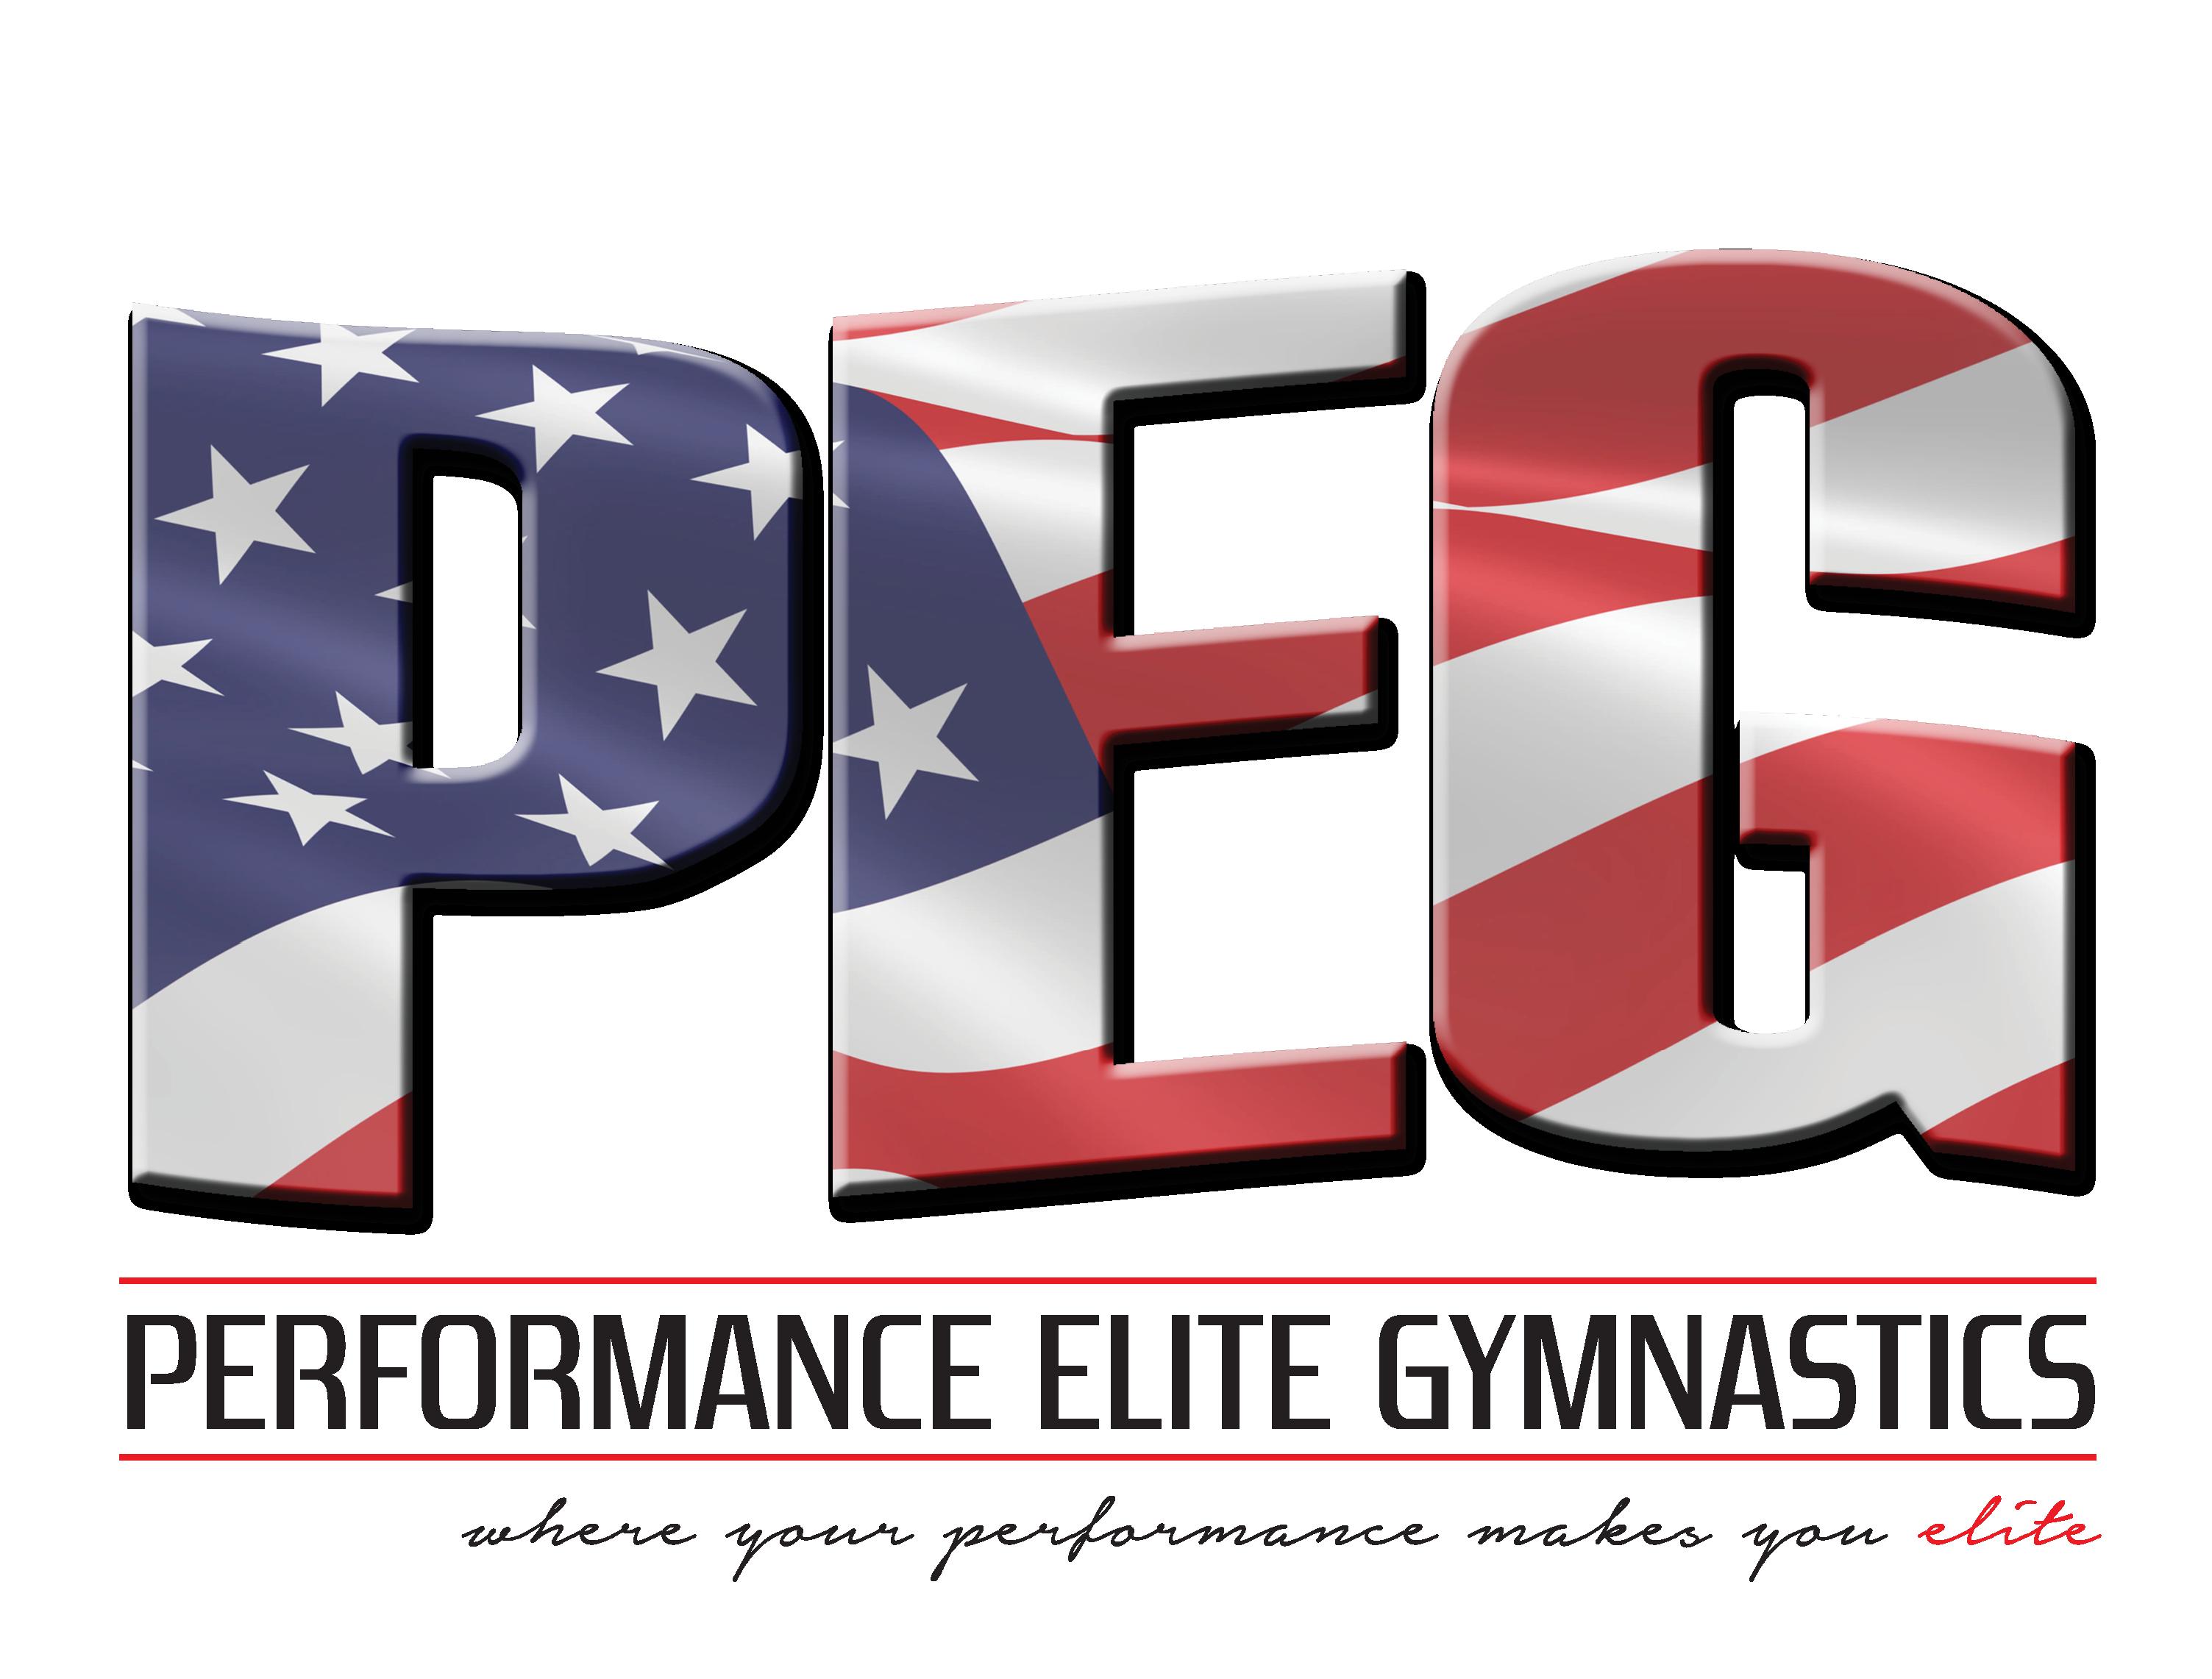 Schedule clipart homeschooling. Performance elite gymnastics classes